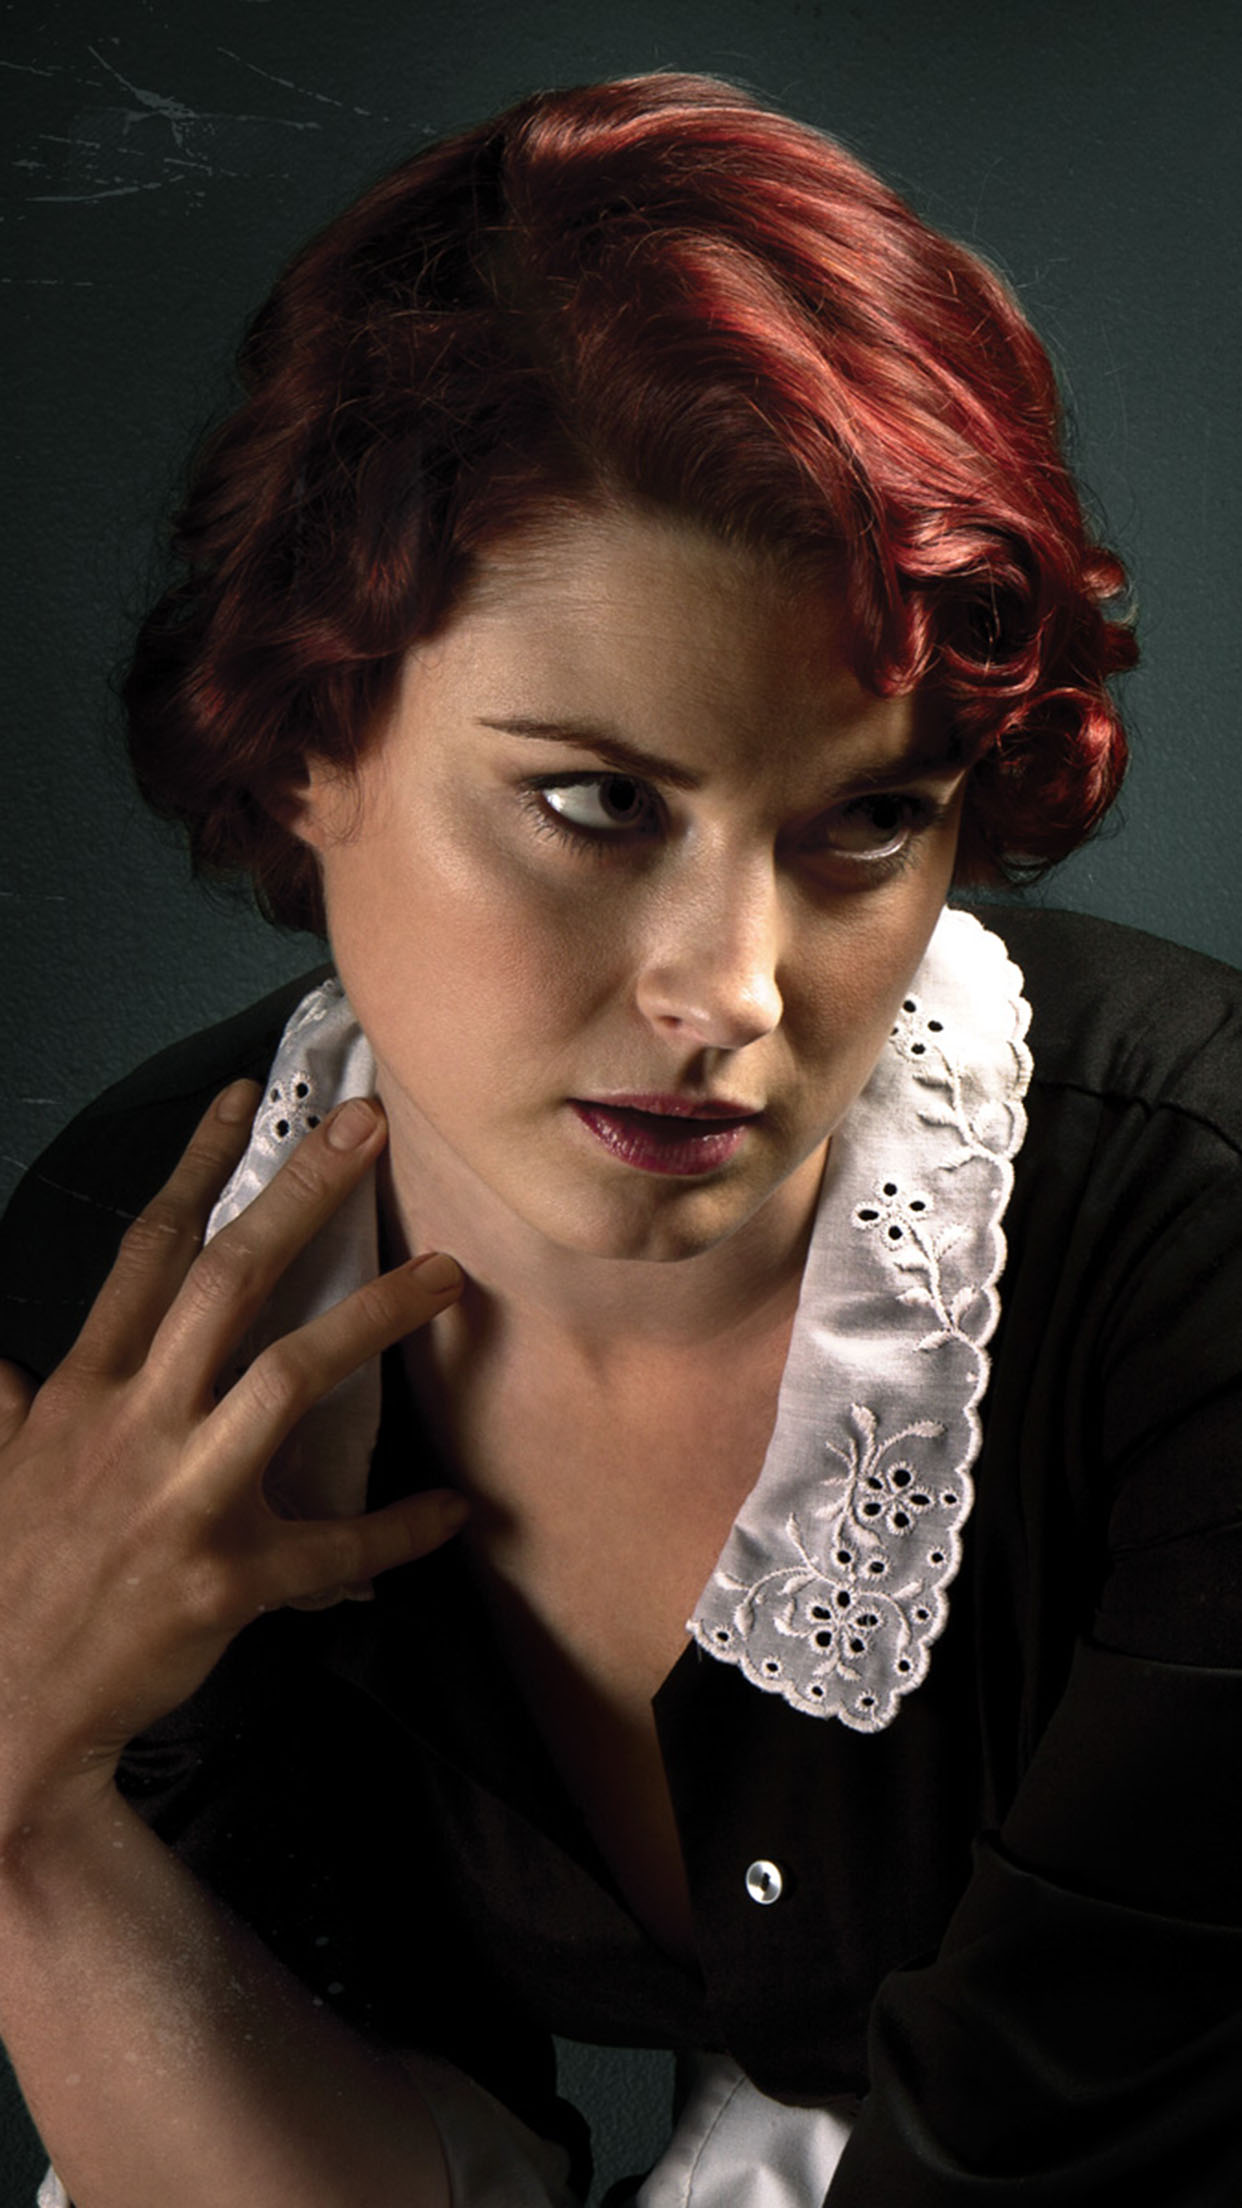 American Horror Story Alexandra Breckenridge 3Wallpapers iPhone Parallax Alexandra Breckenridge